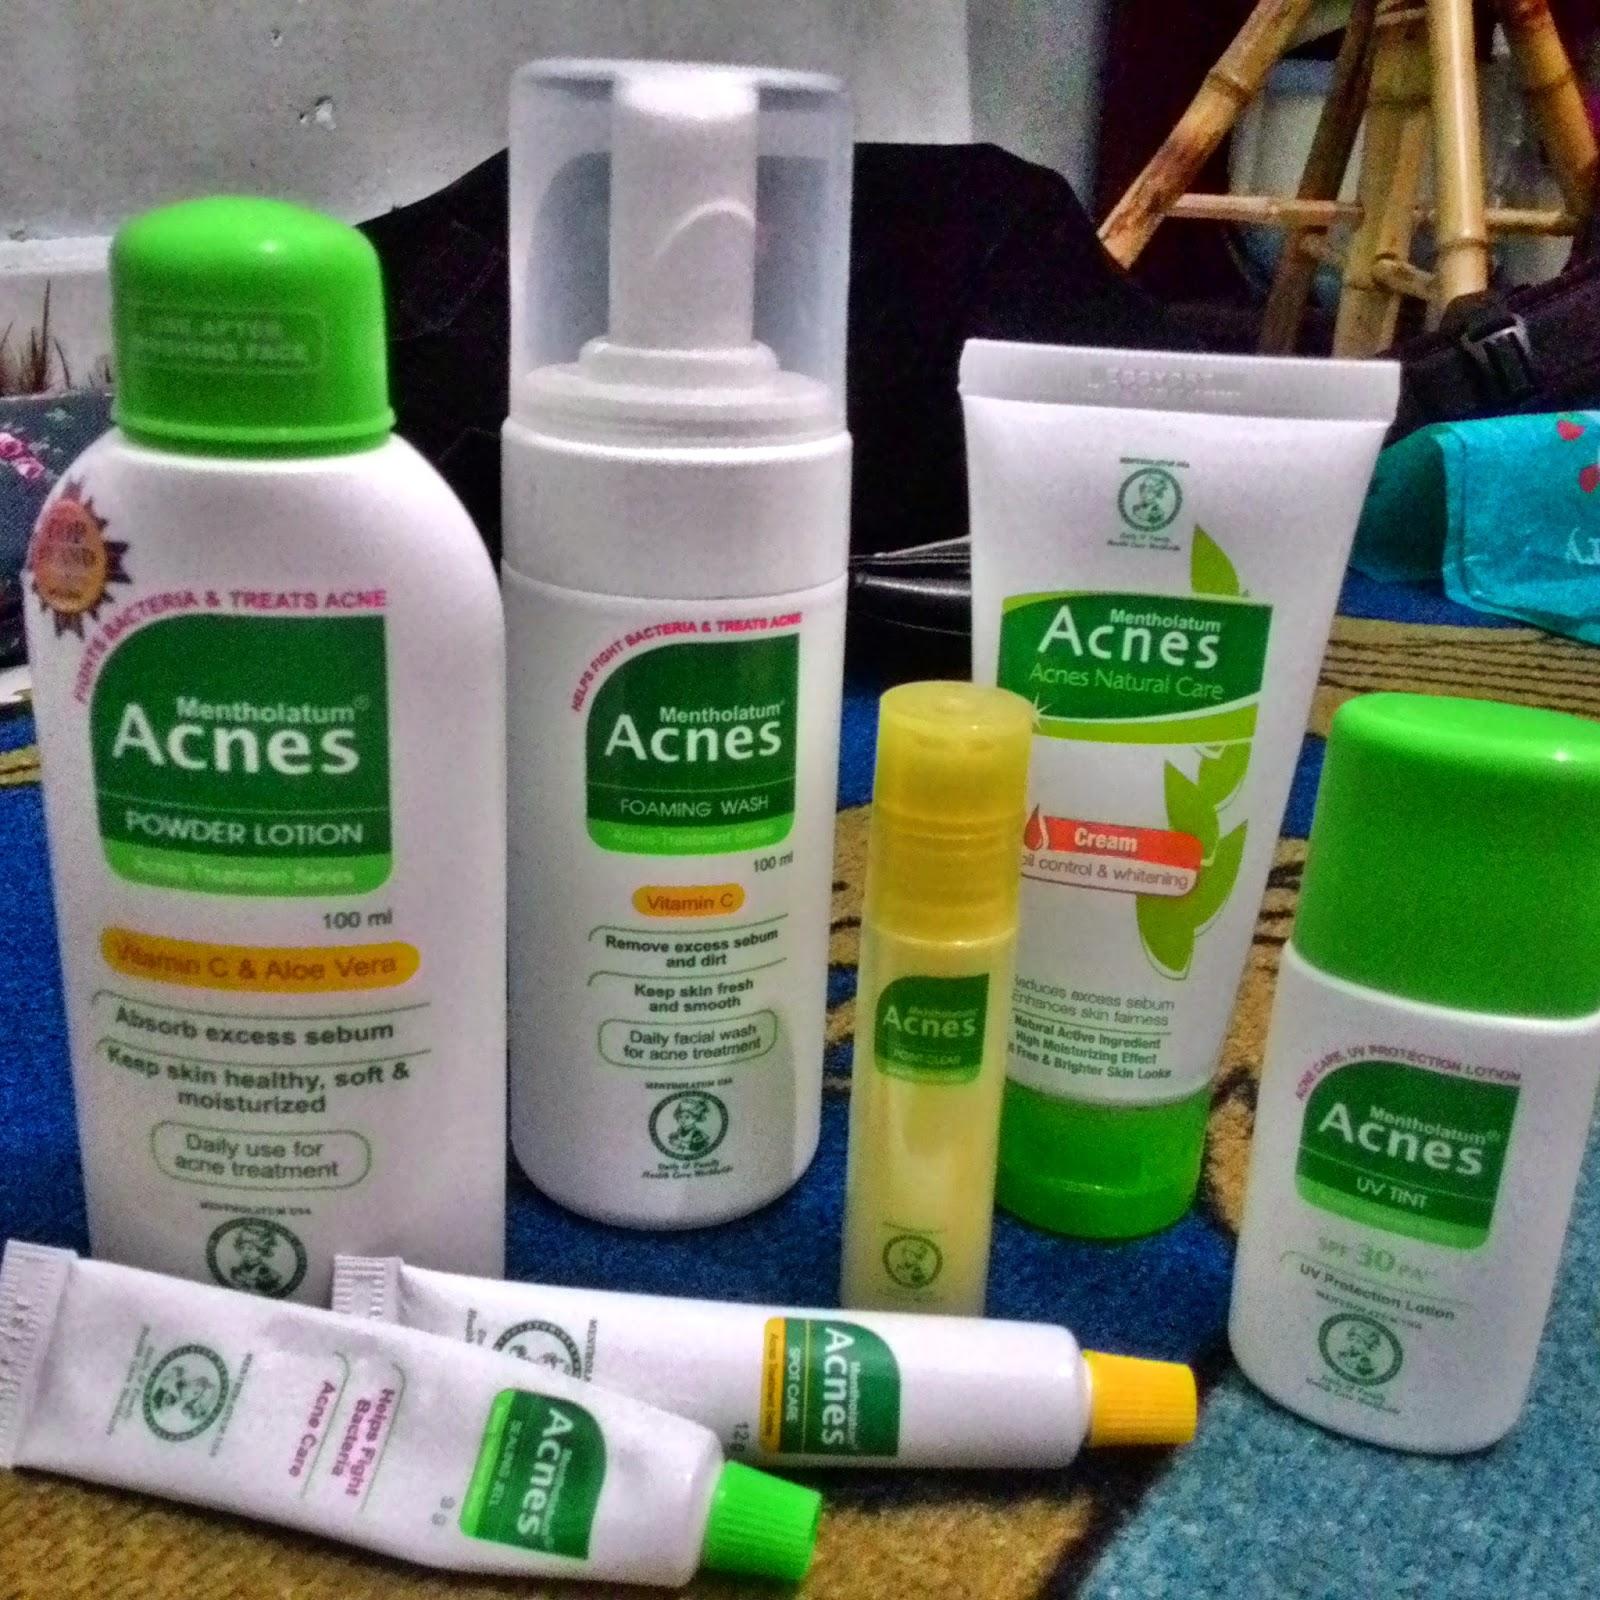 Daftar Harga Jual Acnes Natural Care Dan Treatment Series Face Wash Yogurt Sumber Http Inongsomniacblogspotcoid 2015 04 Review Produk Mentholatum Acneshtml